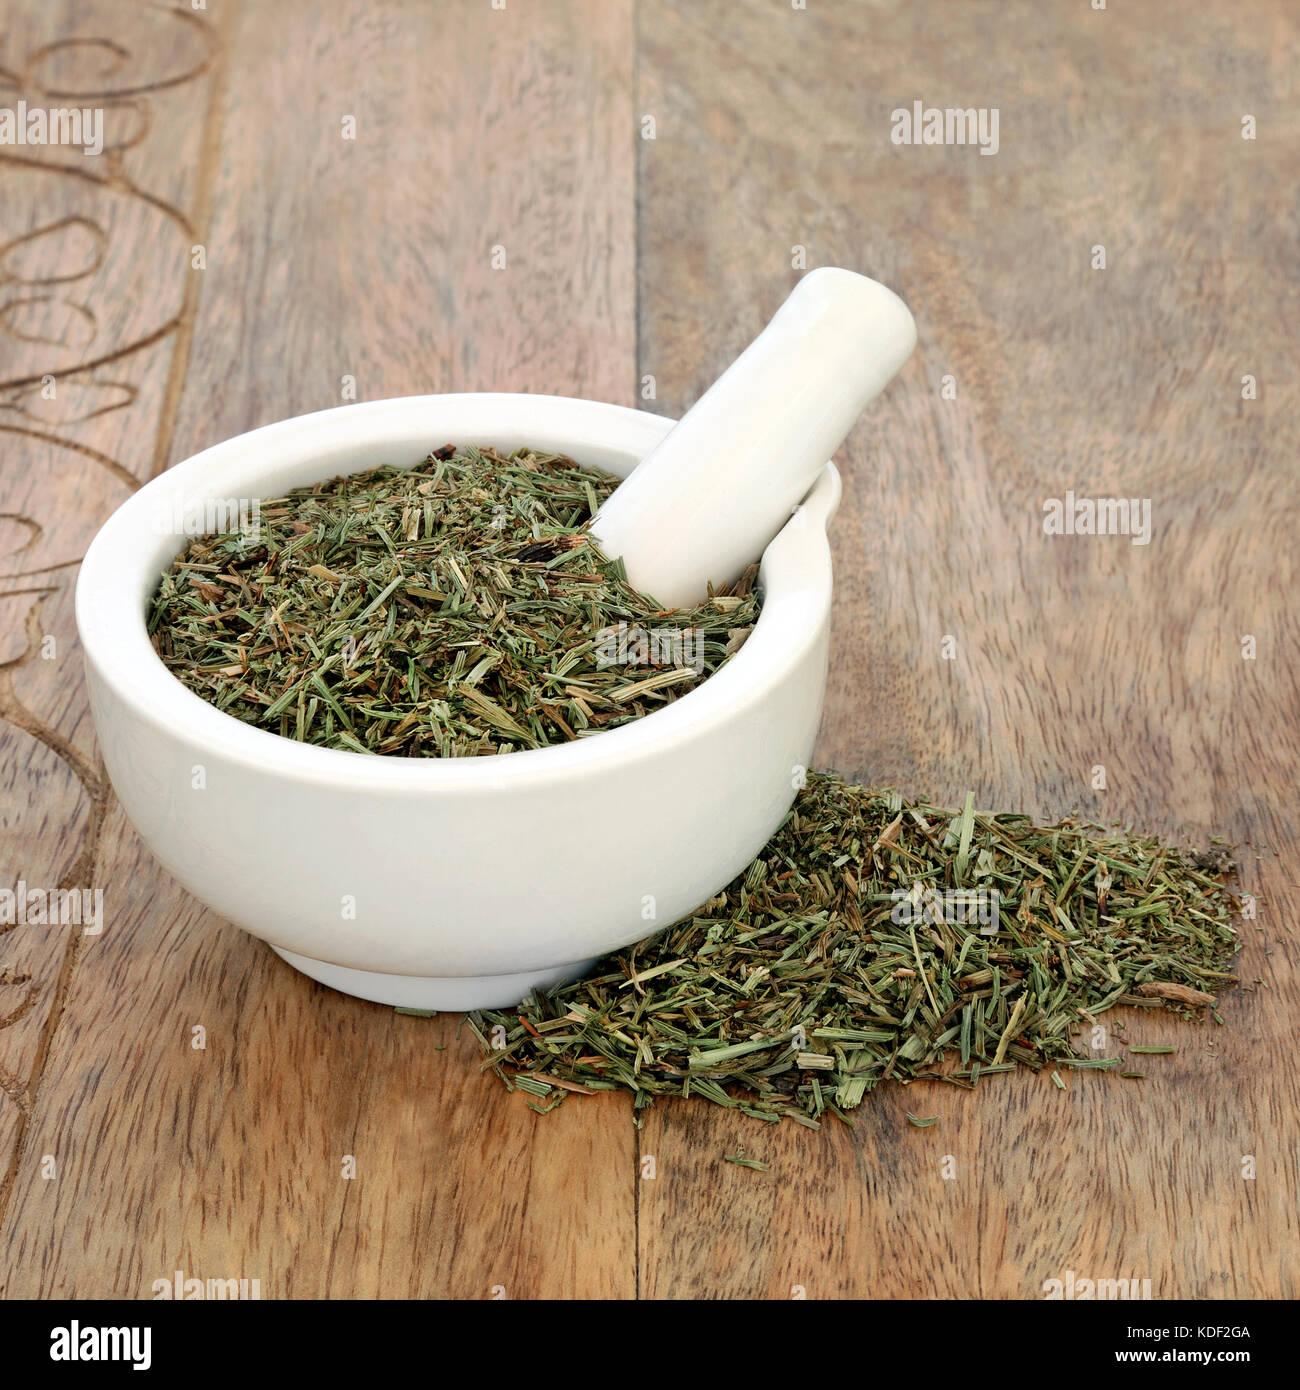 Horsetail leaf herb used in alternative herbal medicine and has anti inflammatory, anti bacterial, diuretic, antiseptic and astringent properties. Stock Photo